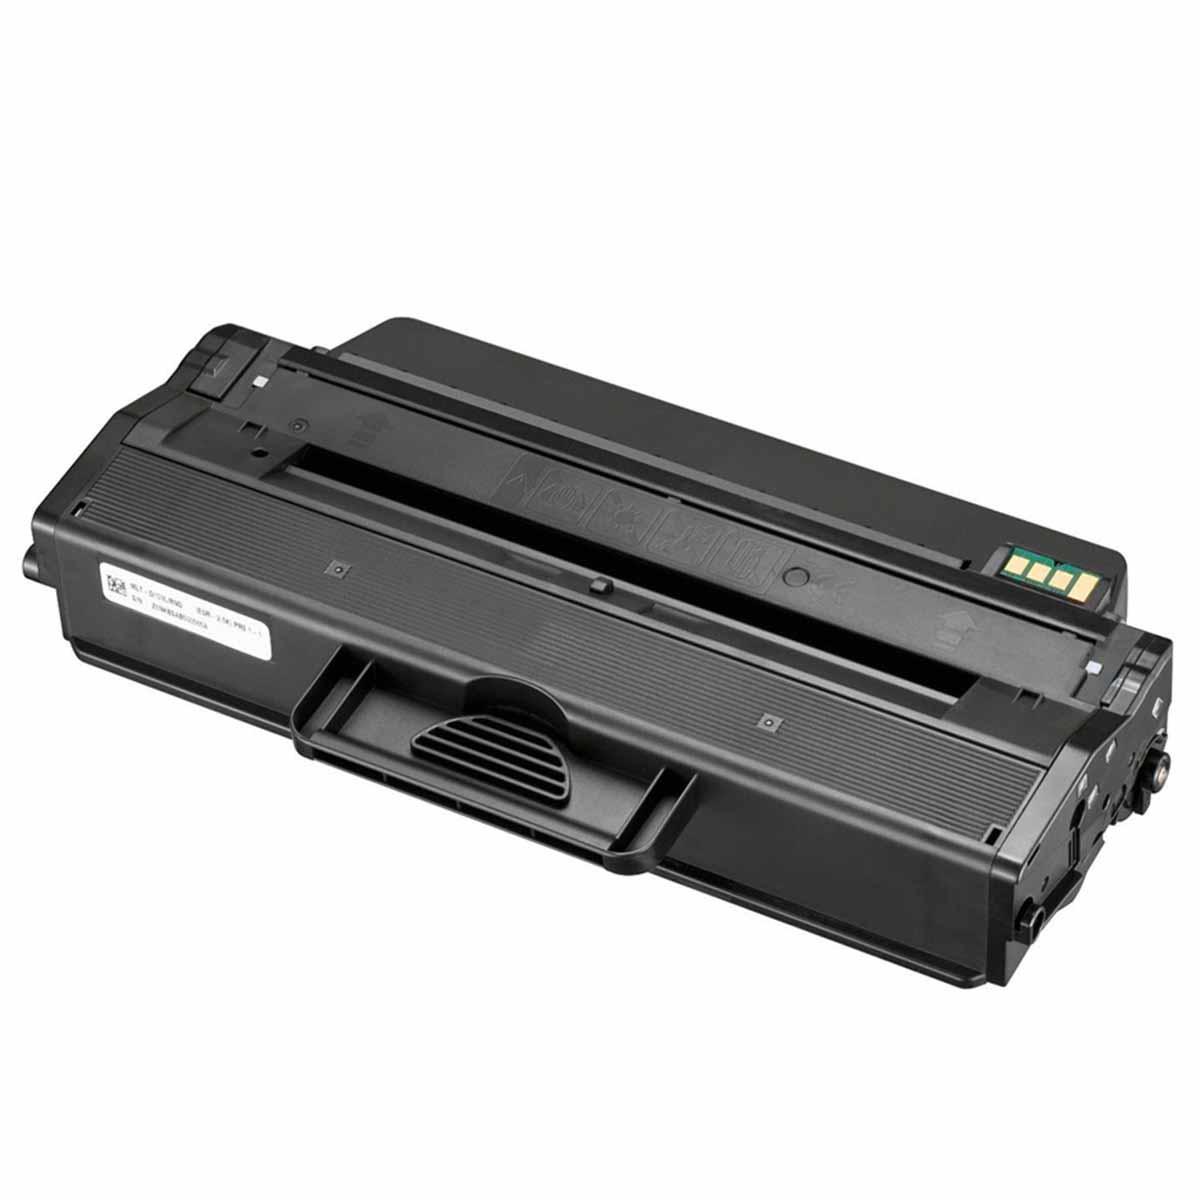 CARTUCHO SAMSUNG MLT-D103L (ML2955/SCX4729)